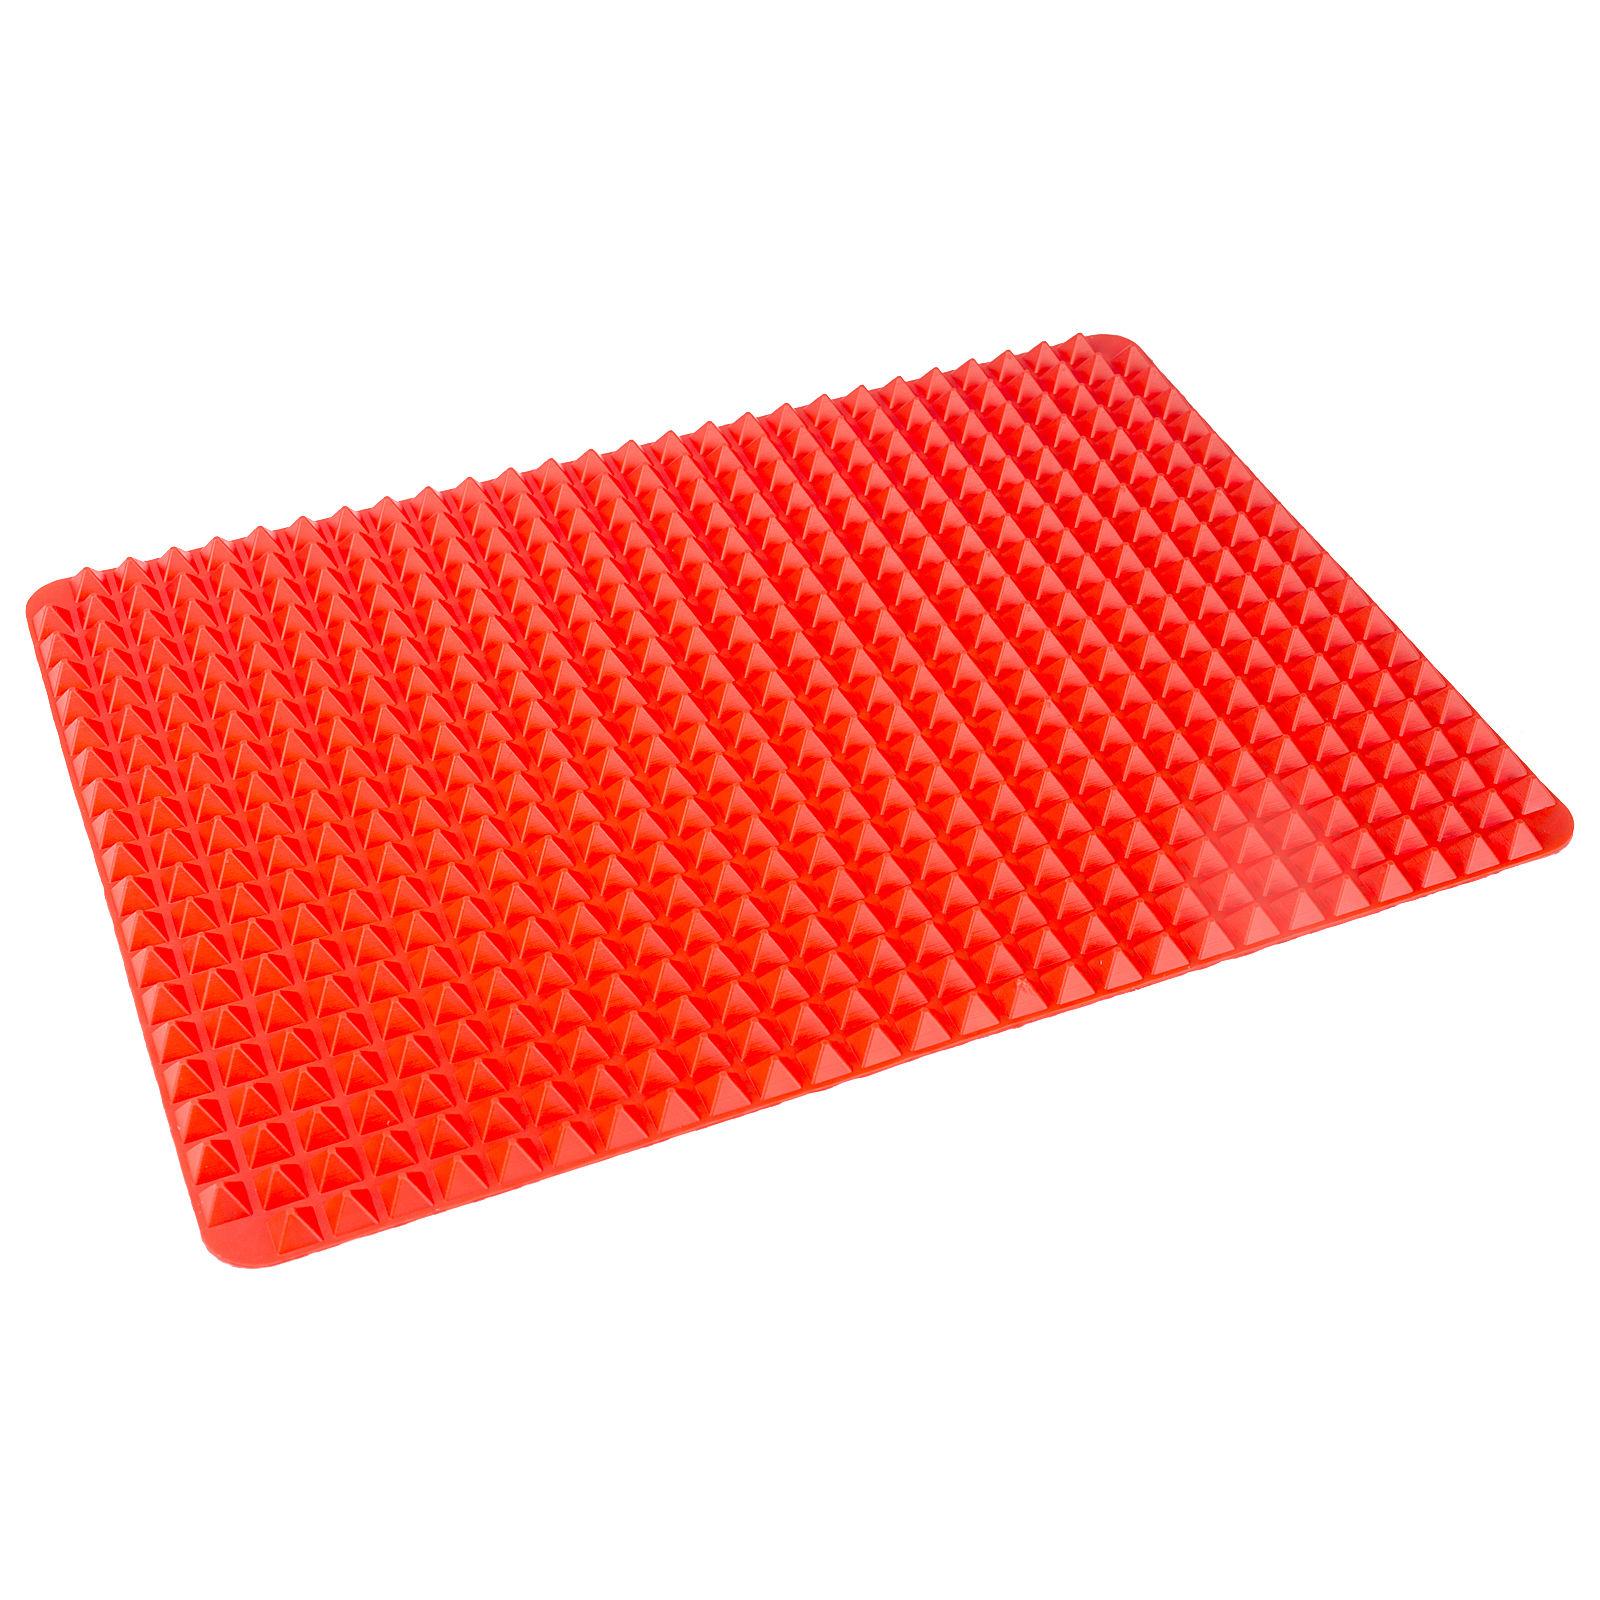 itz mats rubber white heat neoprene square resistant thumbnail insulated rings mat kitchen itm